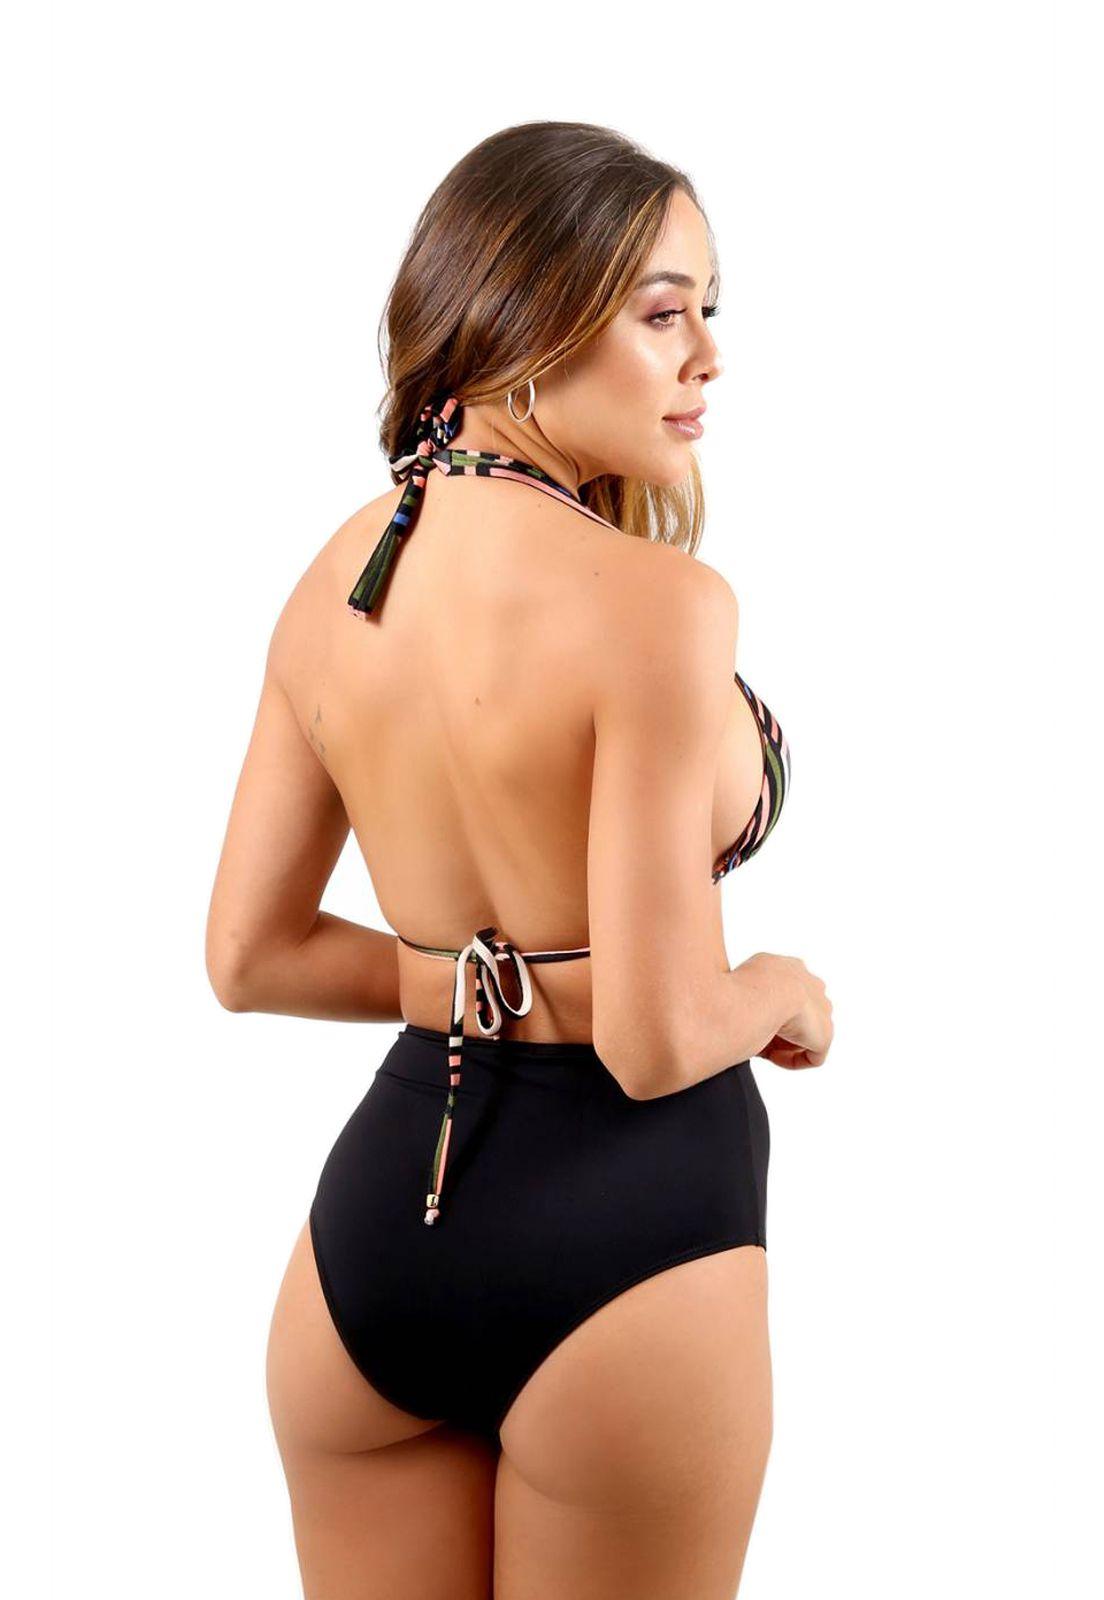 Biquíni Cortininha Flavia Donadio Beachwear Ravello com Hot Pant Preto